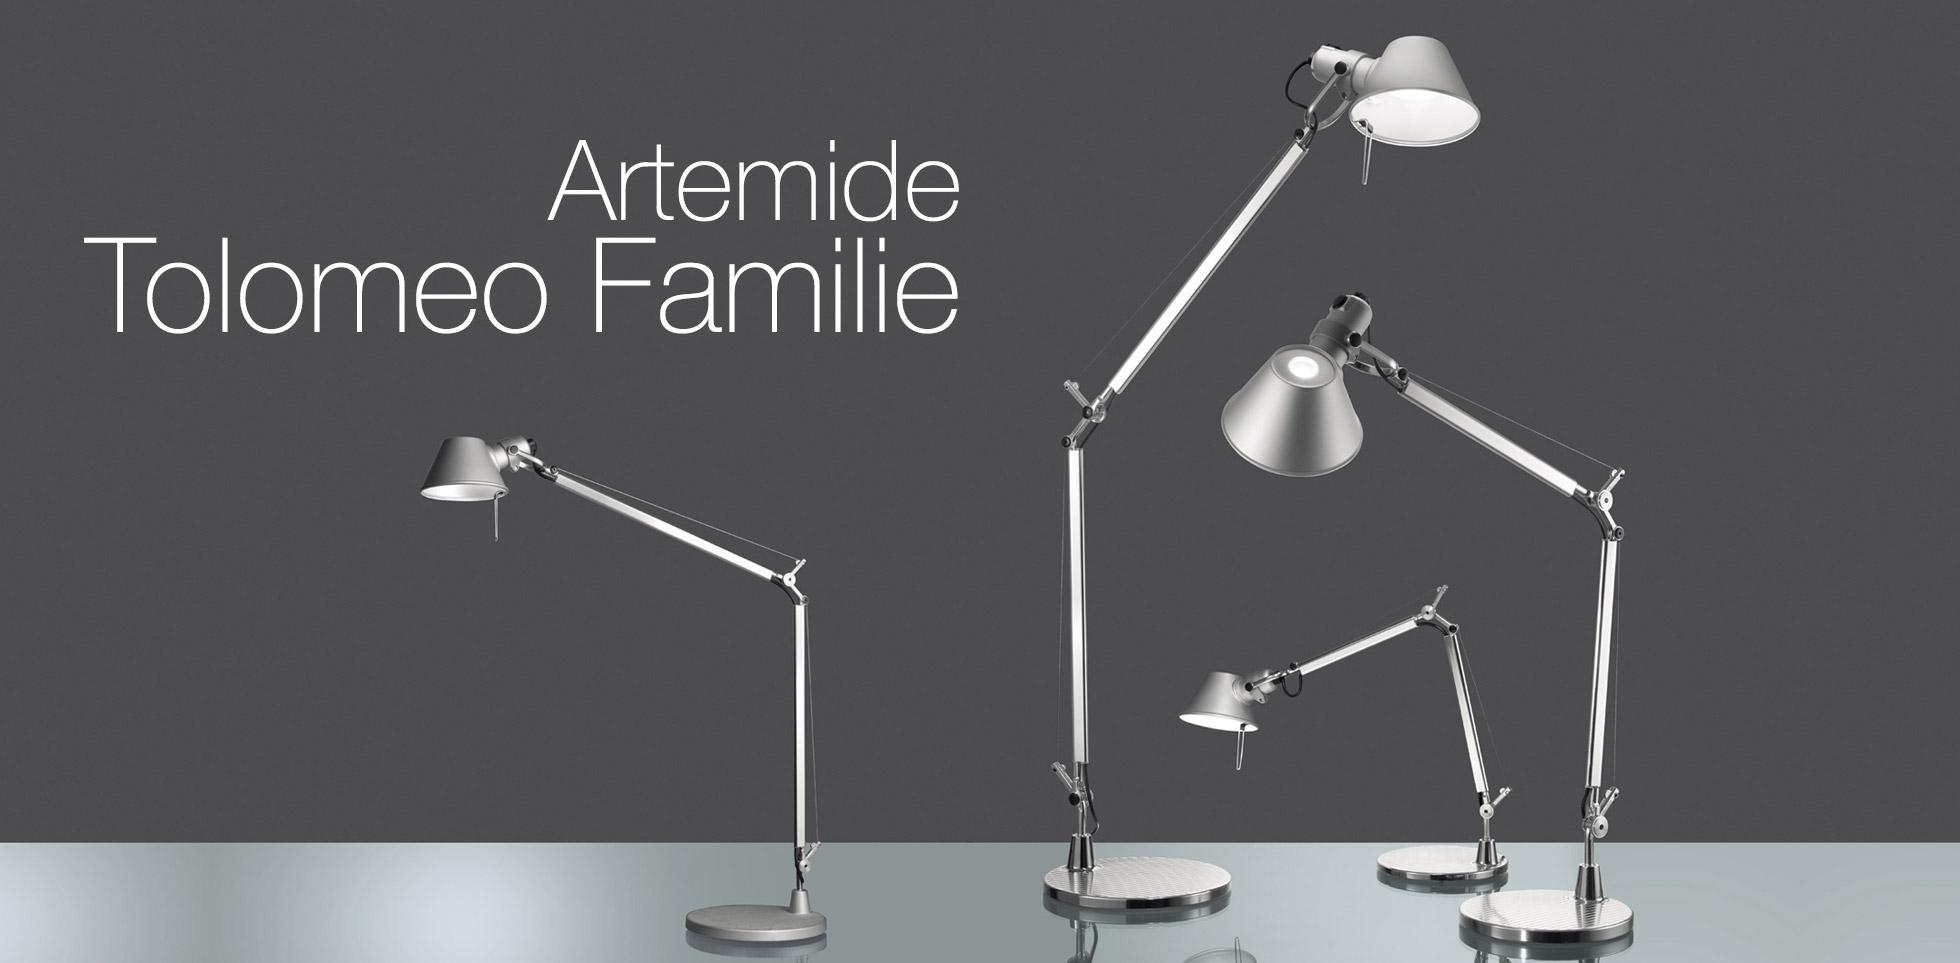 Artemide tolomeo Familie